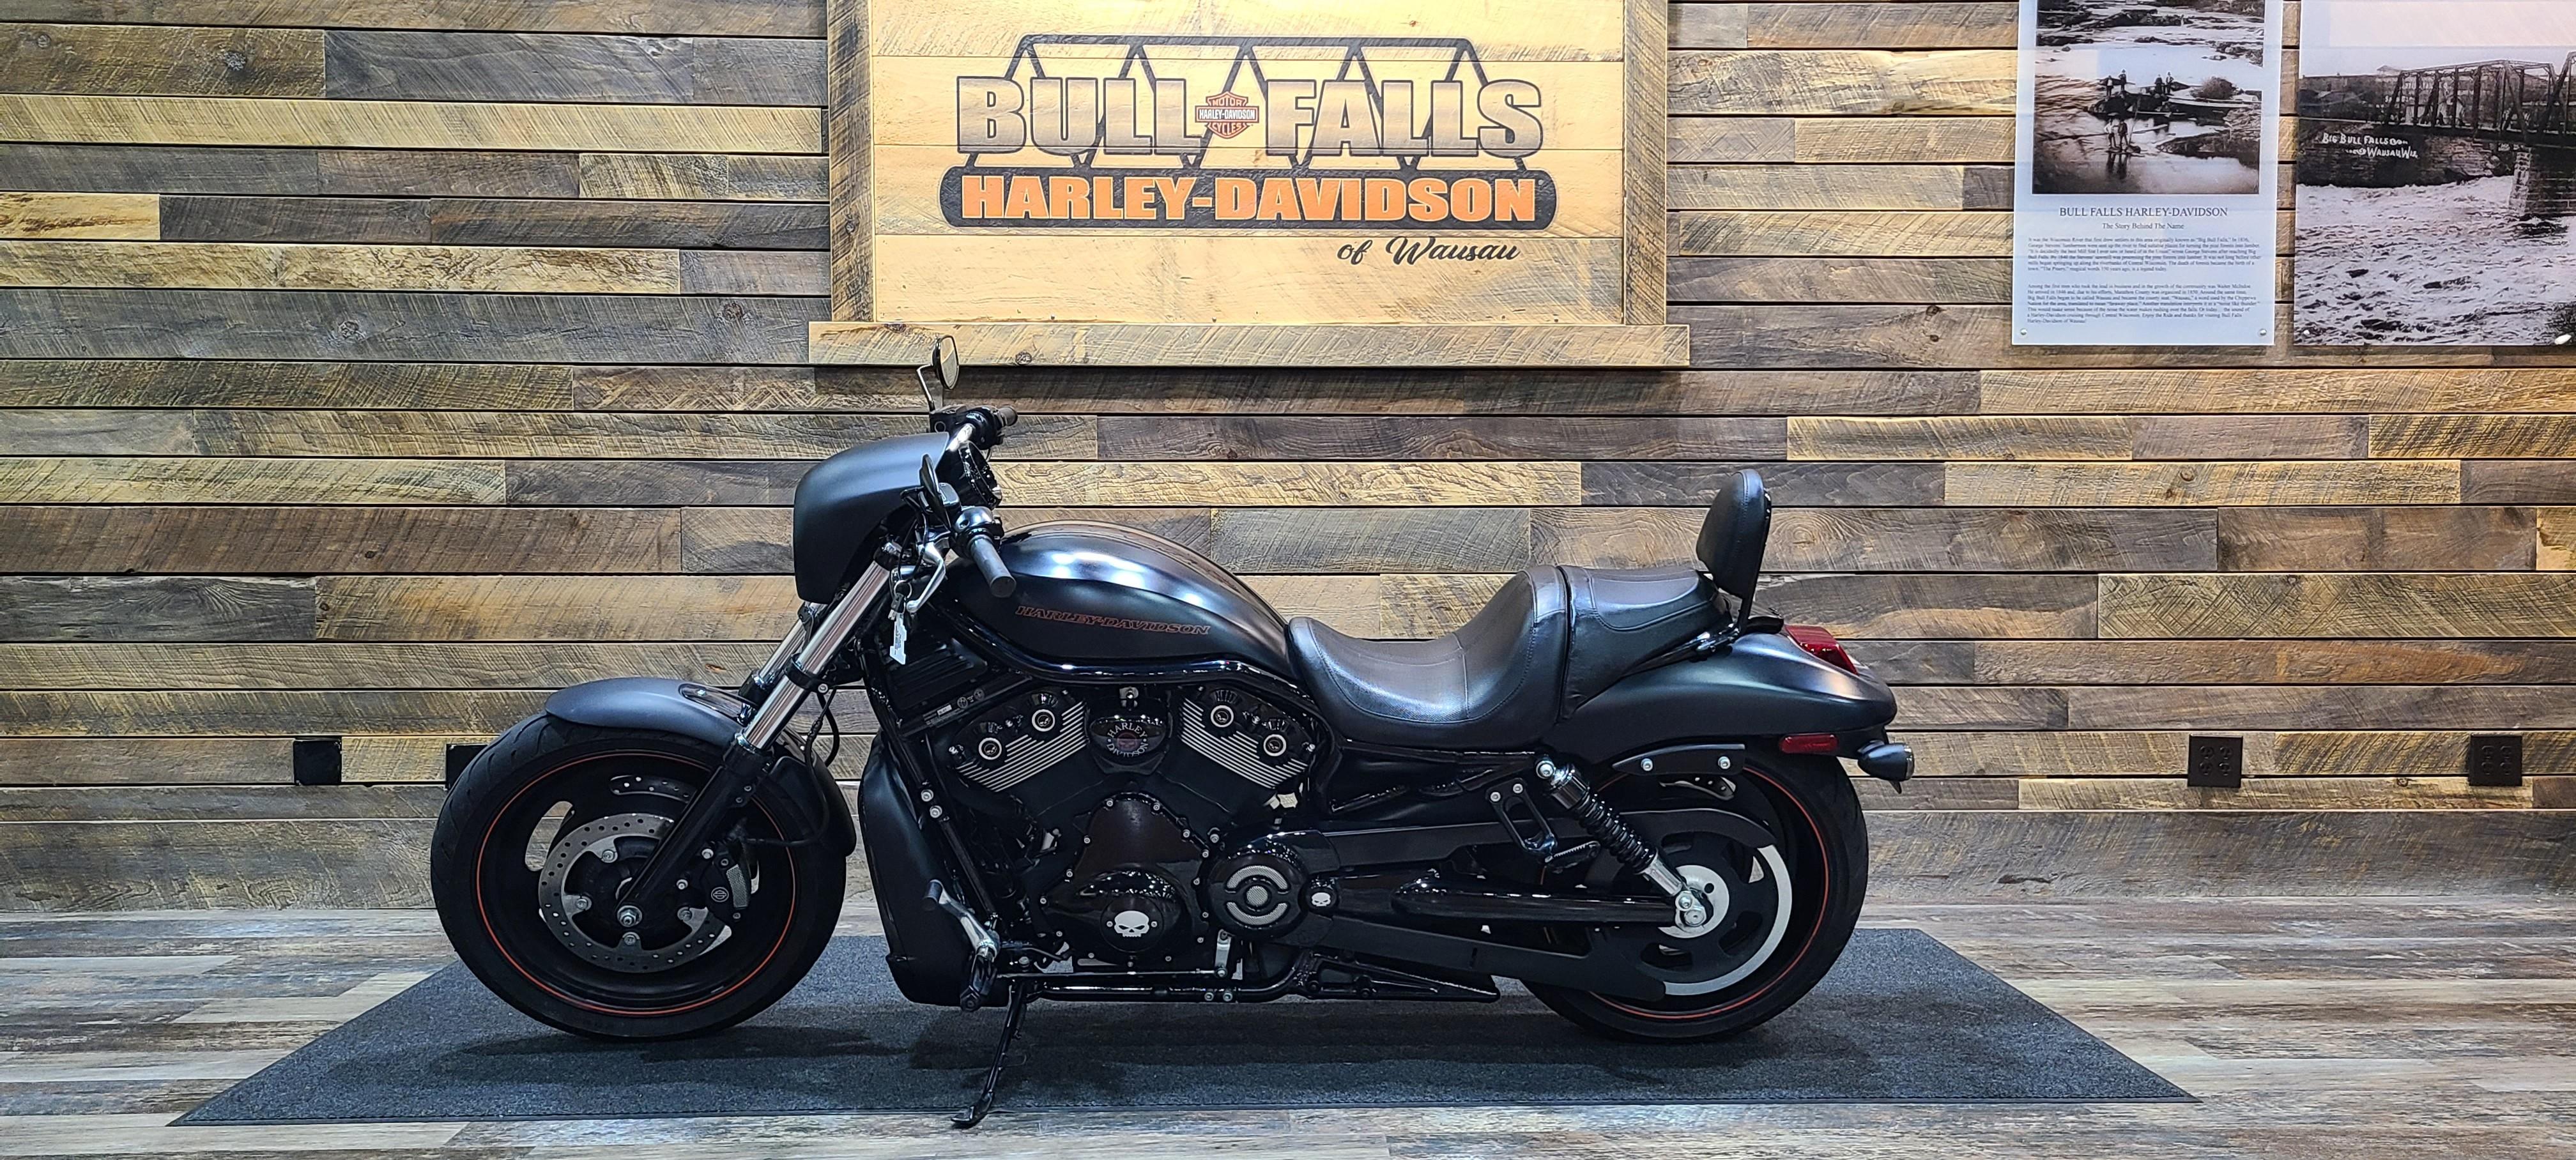 2007 Harley-Davidson VRSC Night Rod Special at Bull Falls Harley-Davidson